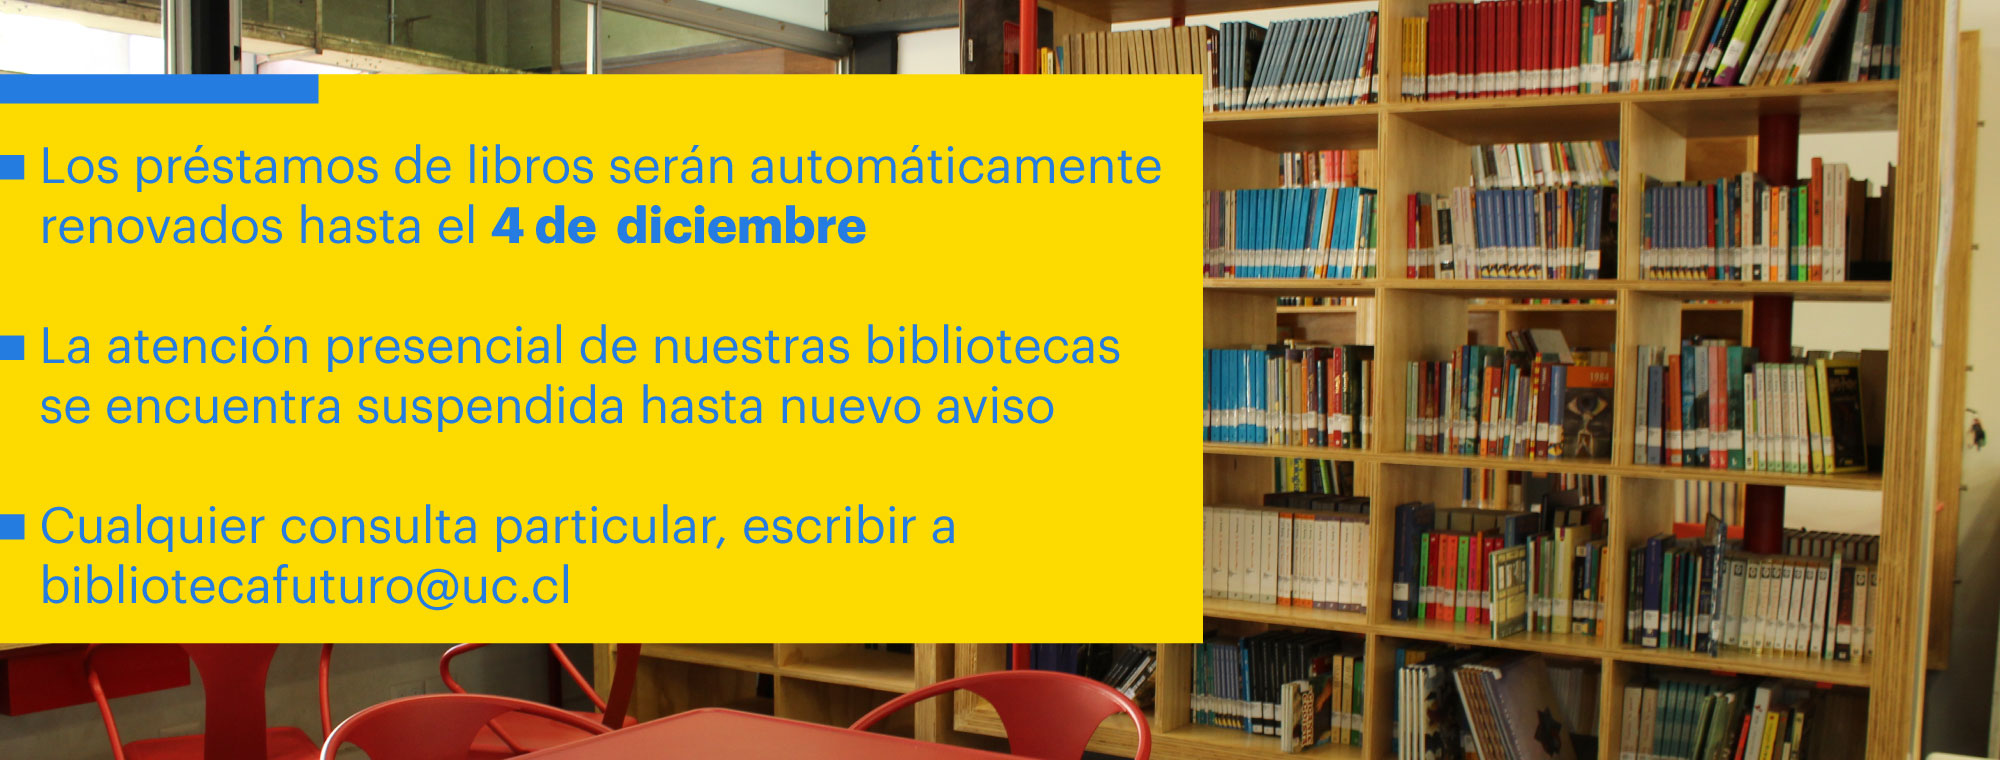 Biblioteca Escolar Futuro